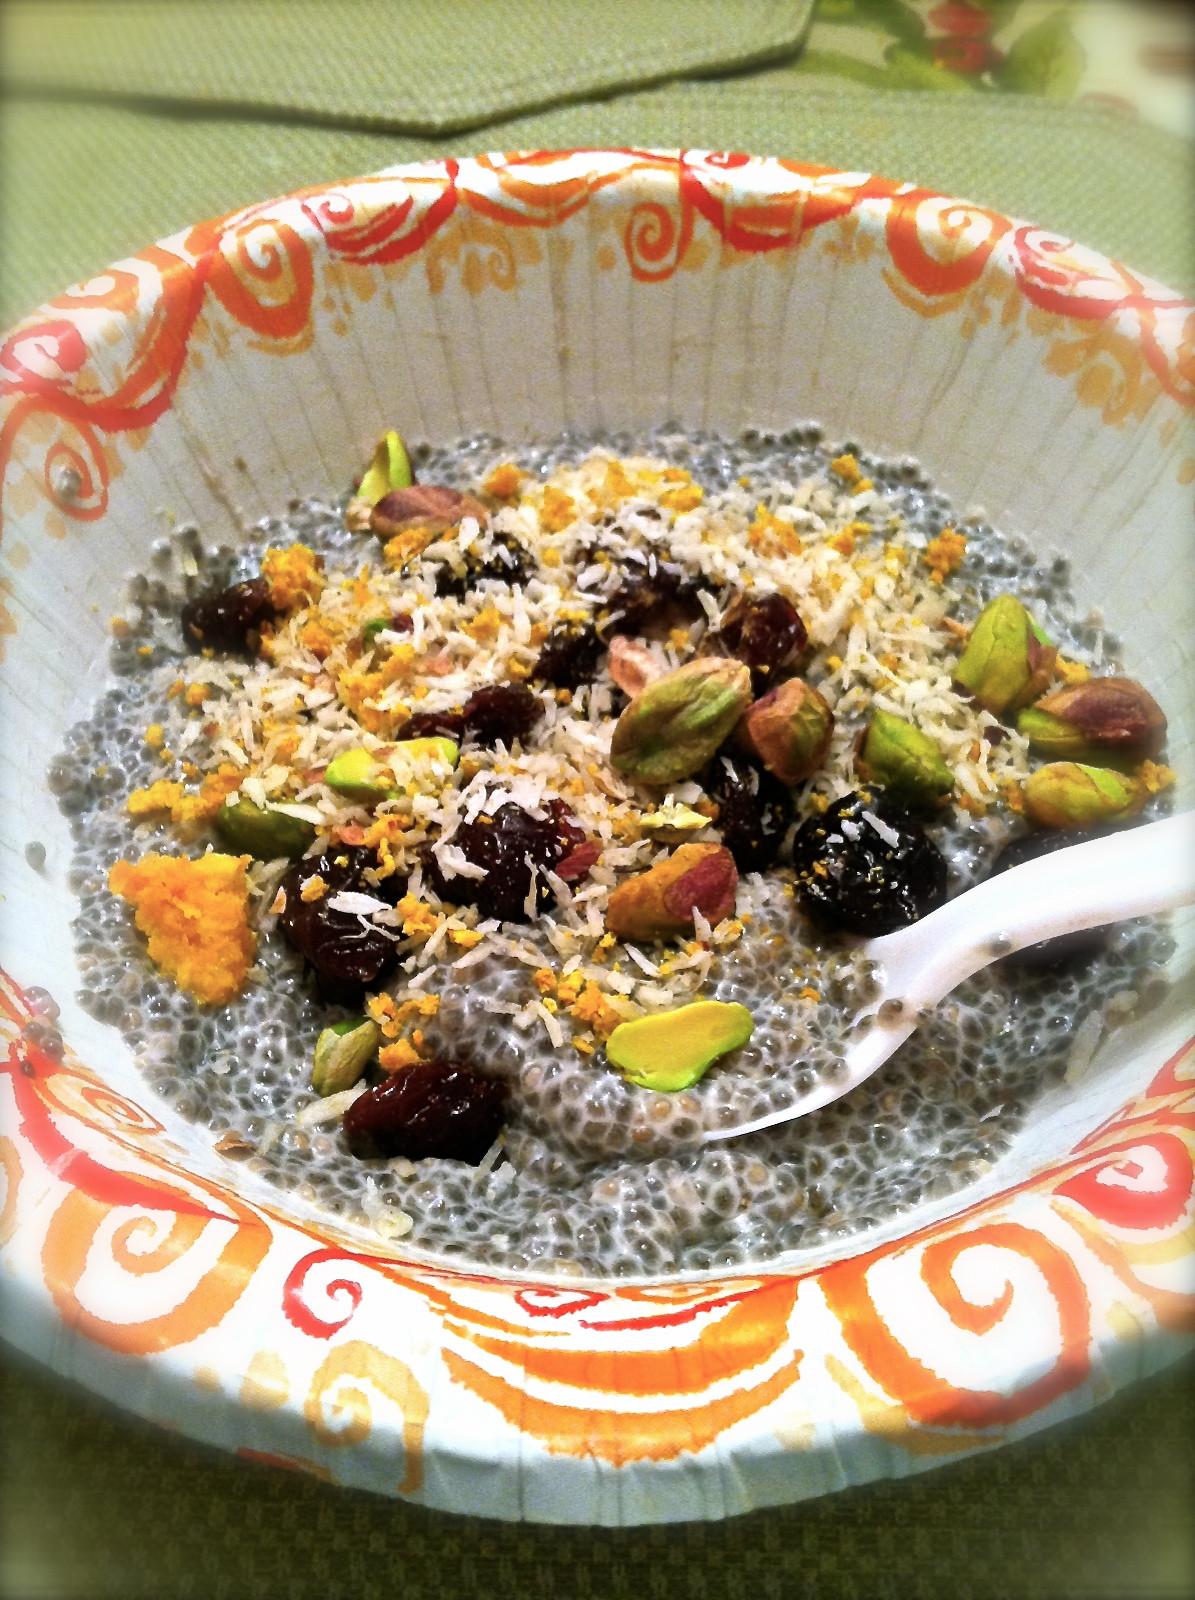 Chia Seed Breakfast Recipes  Healthy Chia Seed Breakfast